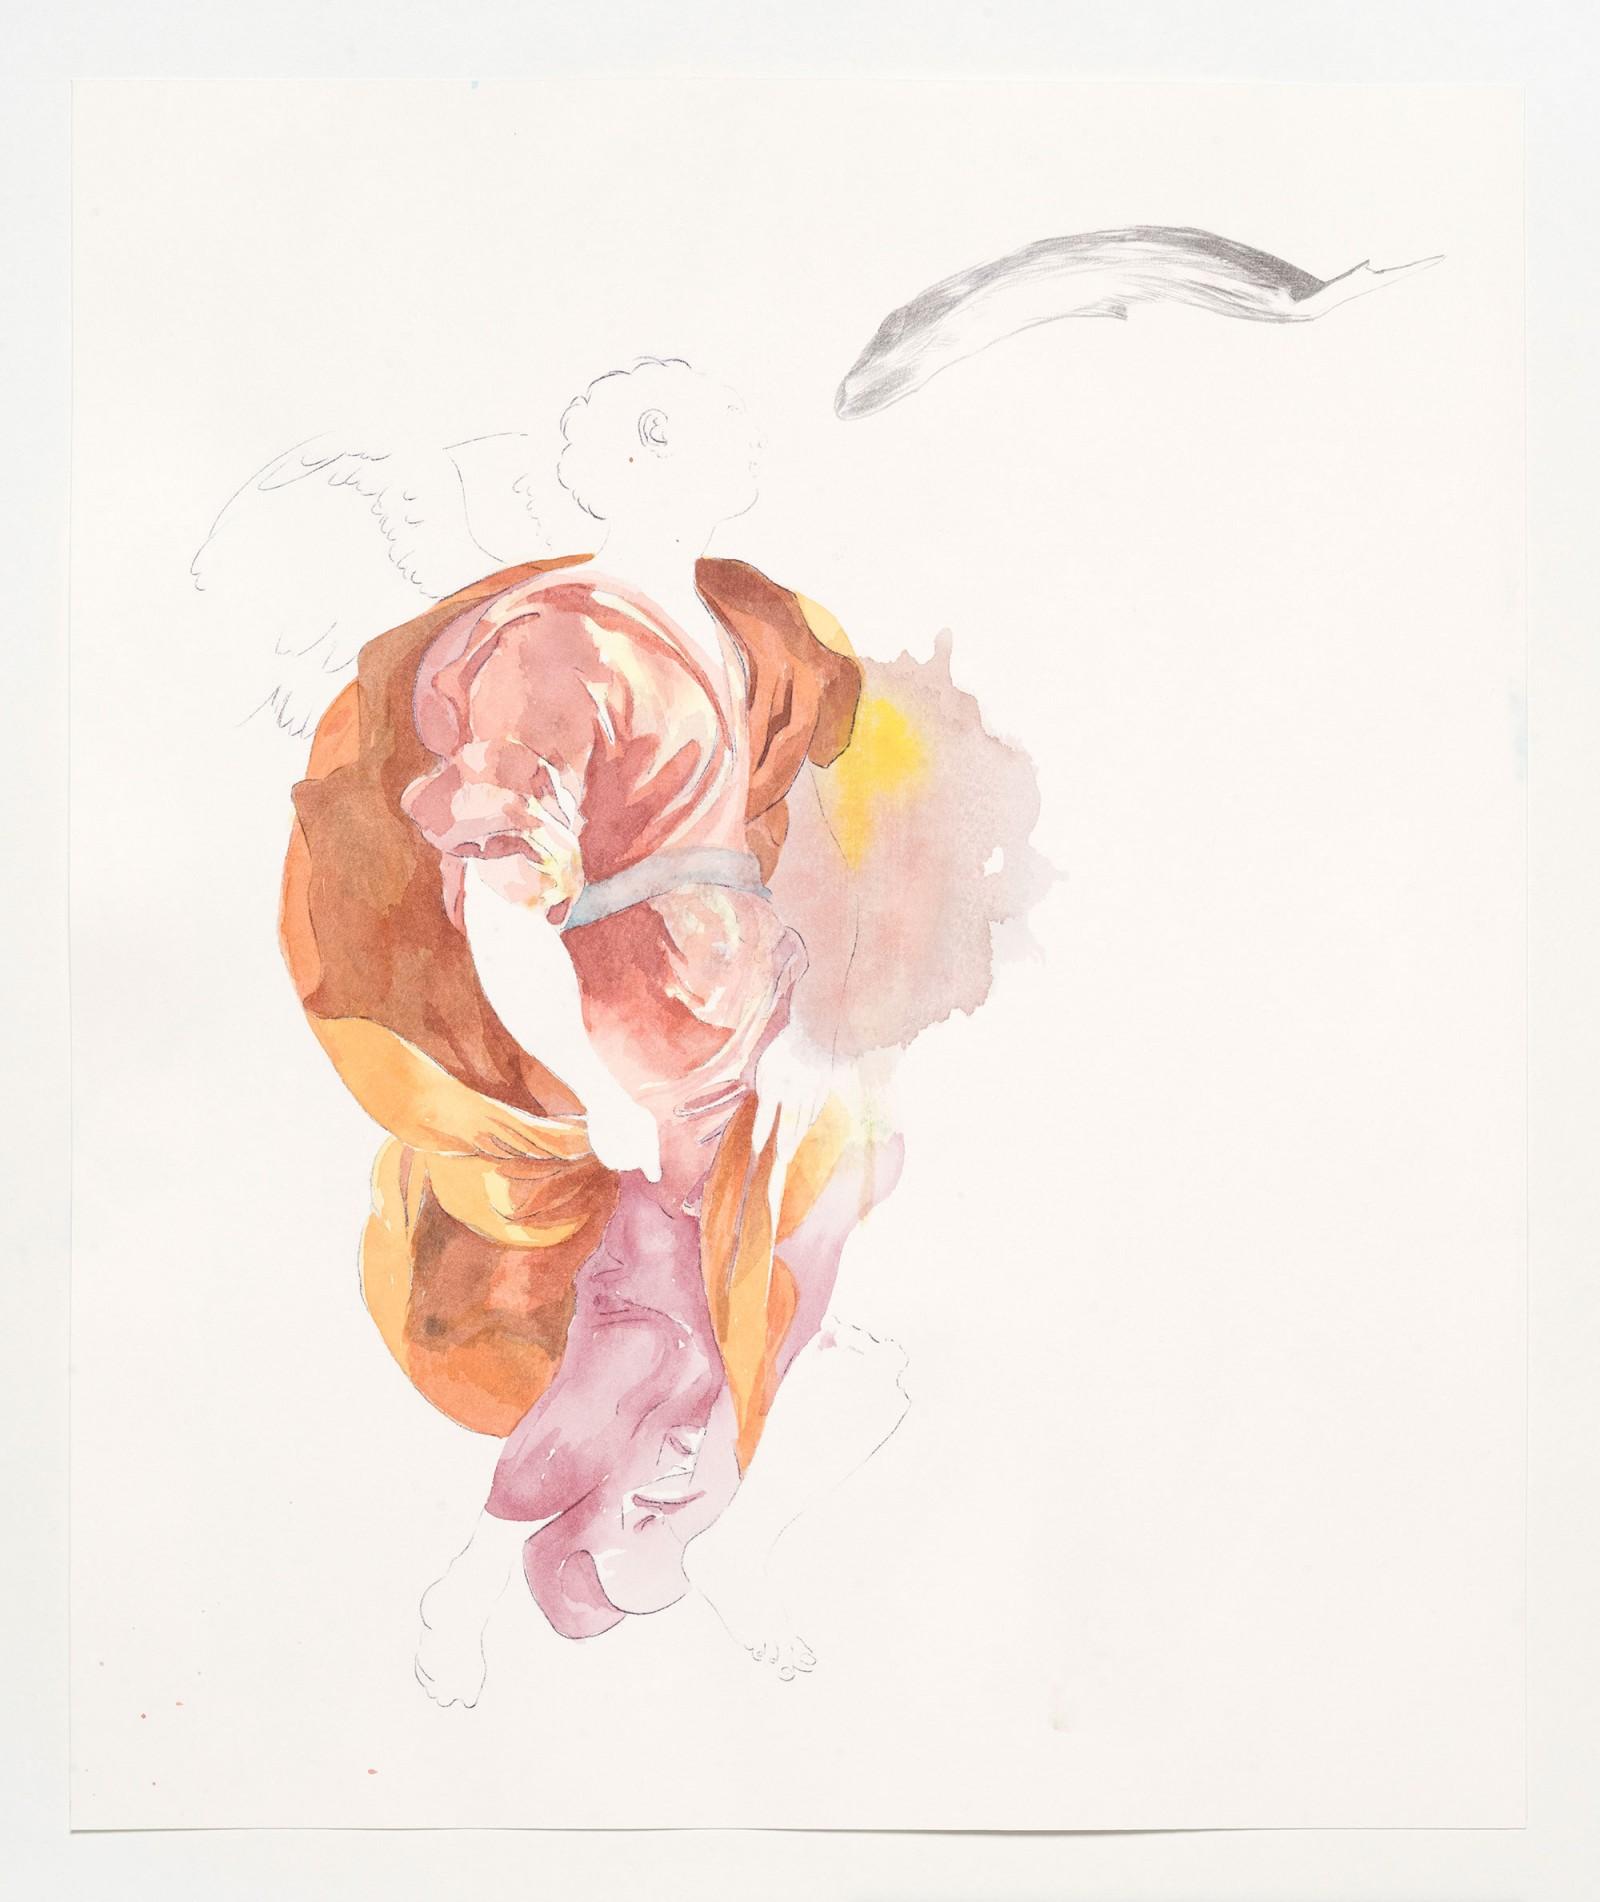 Kim Nekarda: untitled, 2019, carbon, pencil & watercolour on paper, 50 x 42 cm